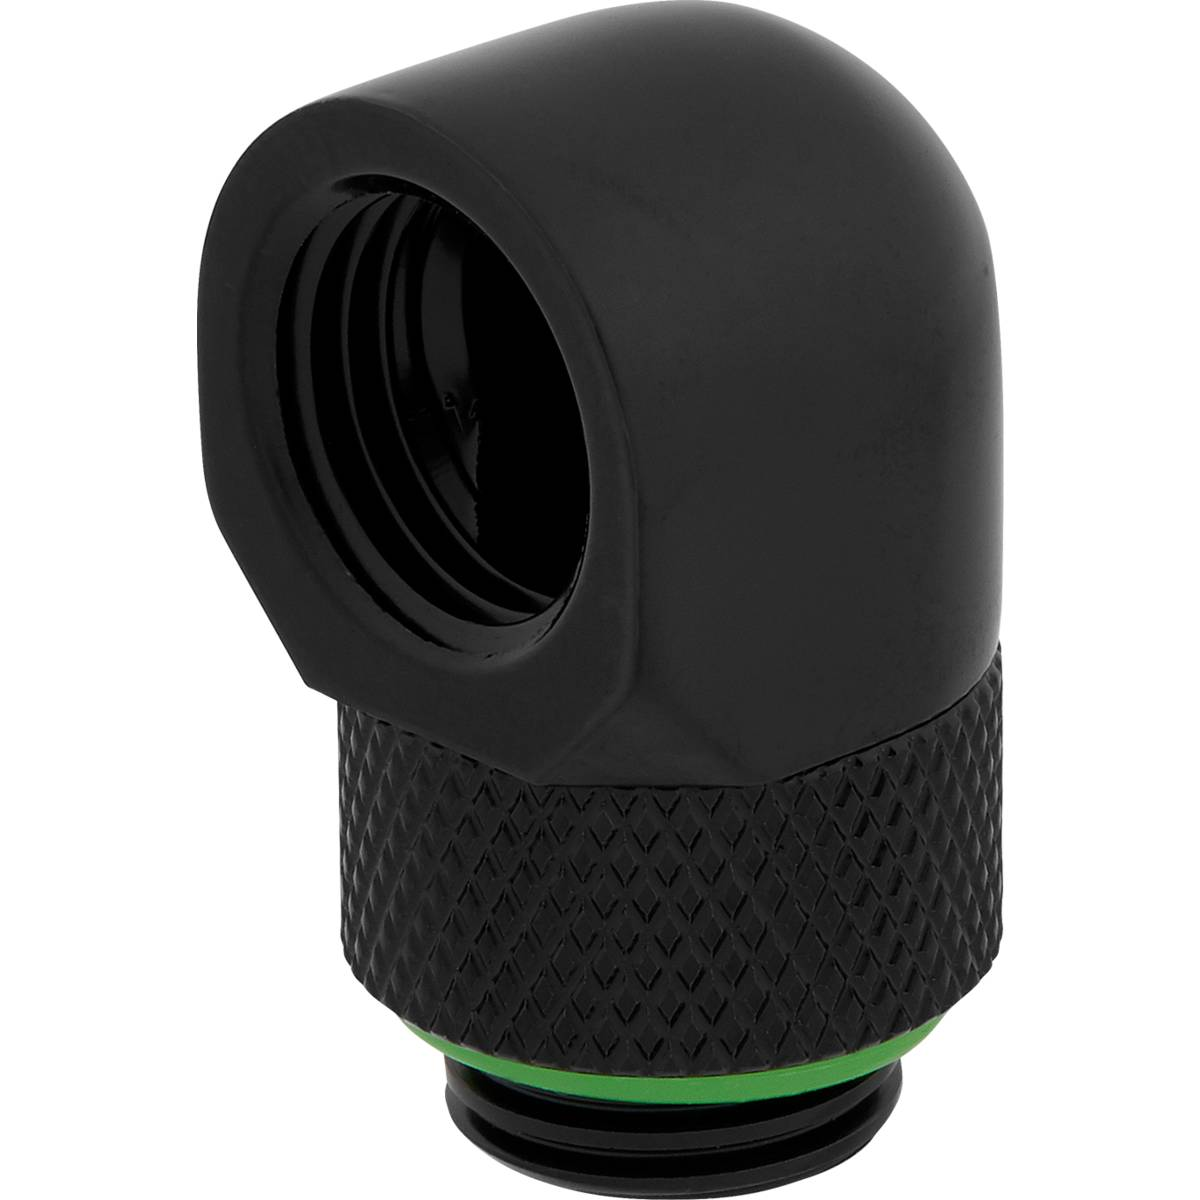 CORSAIR Hydro X Series 90° Rotary Adapter Twin Pack - Black